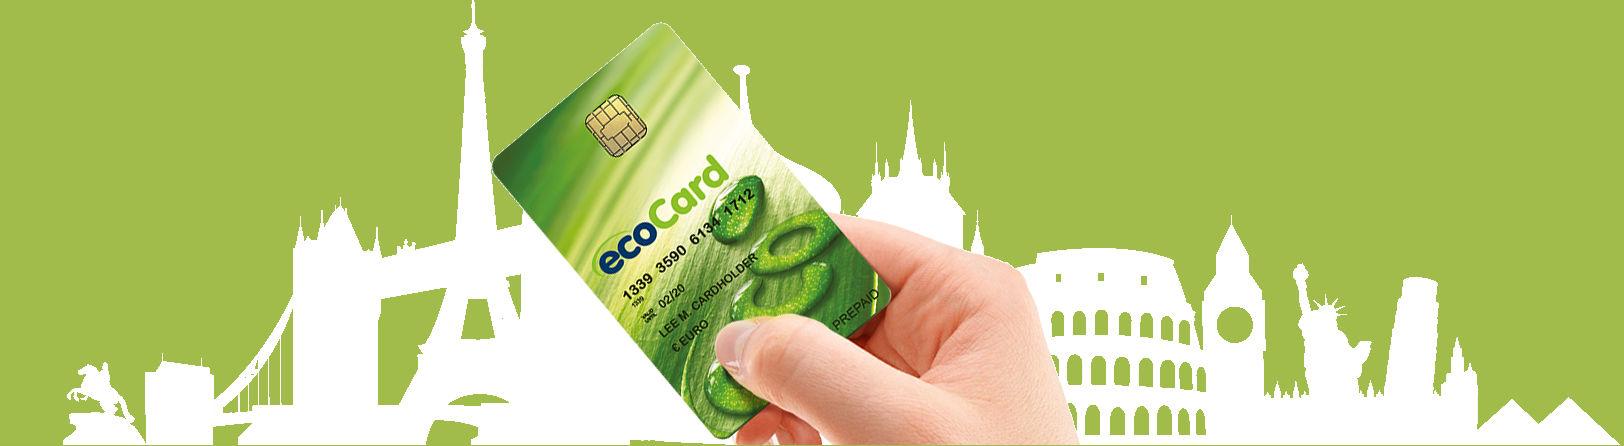 EcoCard / EcoPayz:在线娱乐场最佳搭档